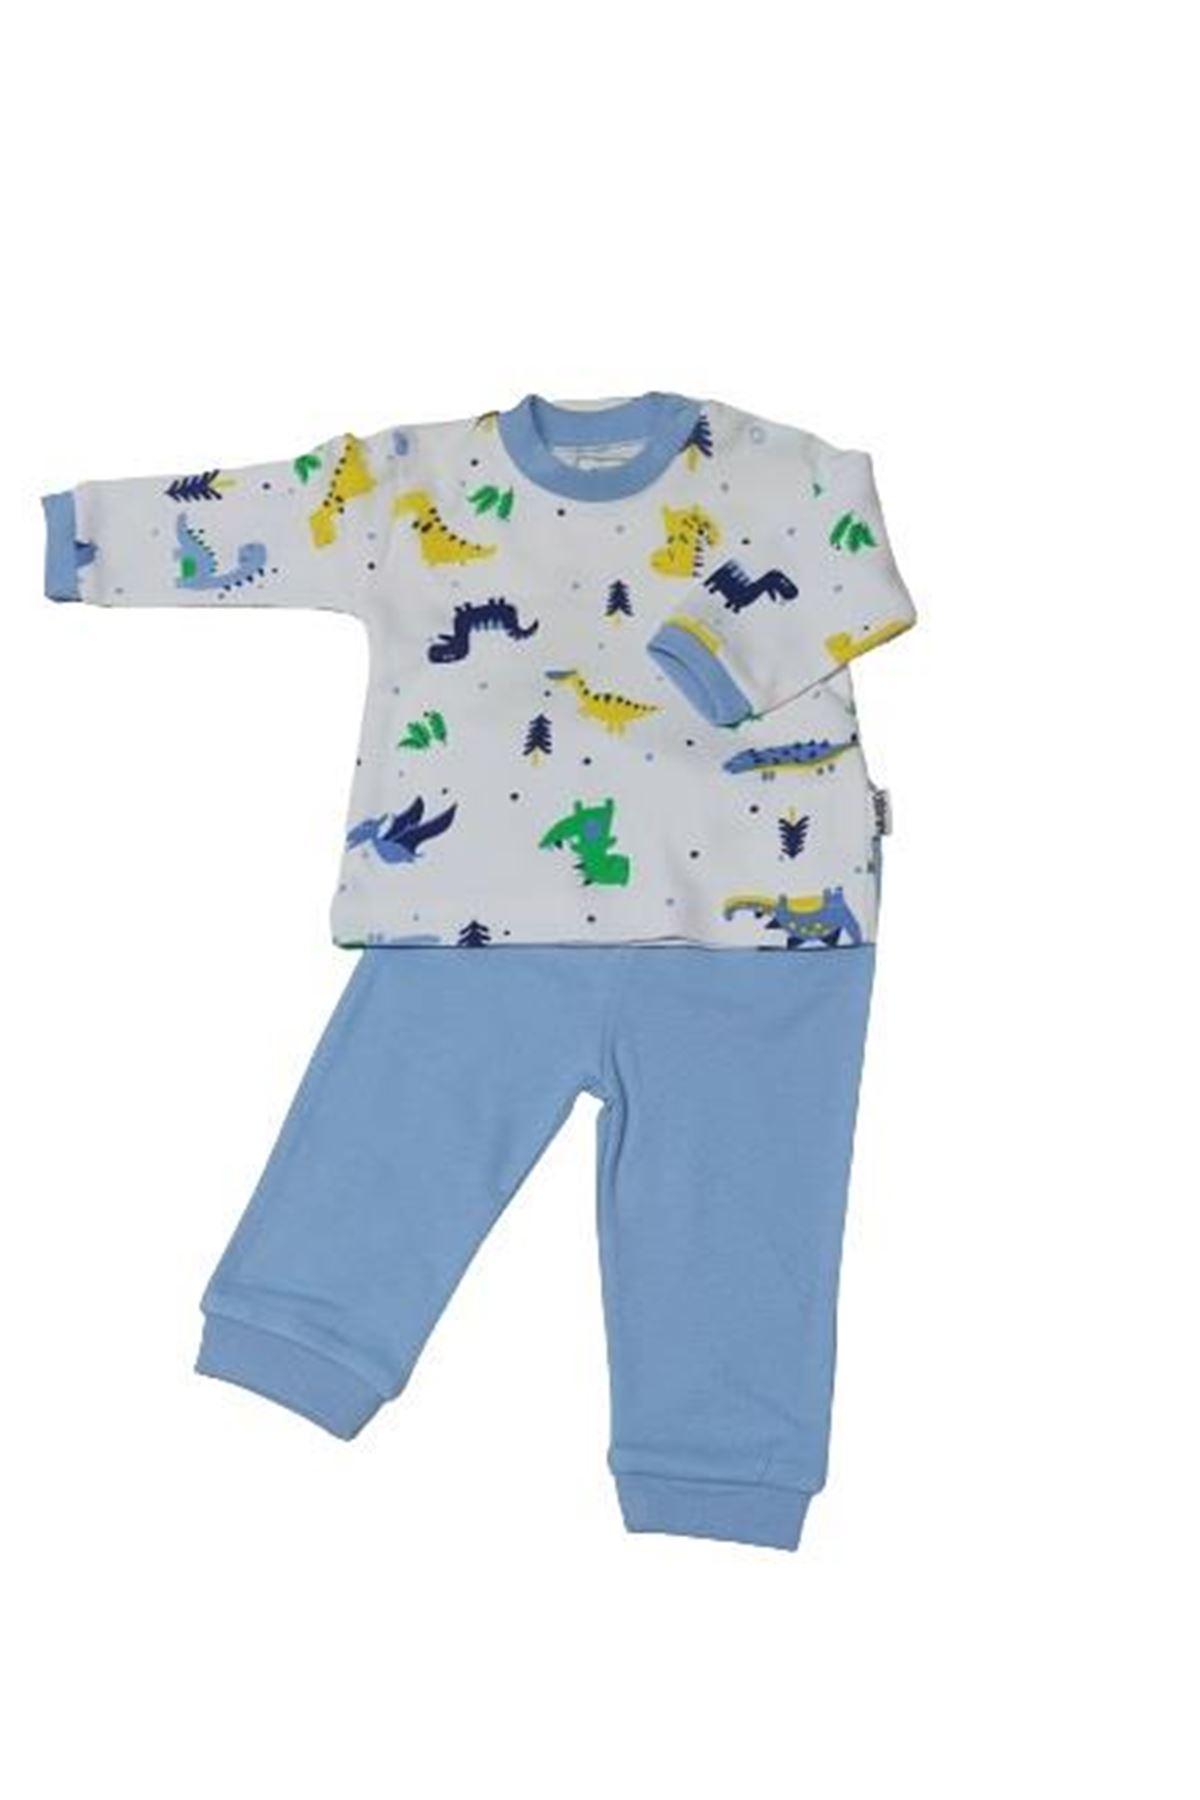 Albimini Minidamla Dinozorlu Bisiklet Yaka Bebe Pijama Takımı 11985 Mavi